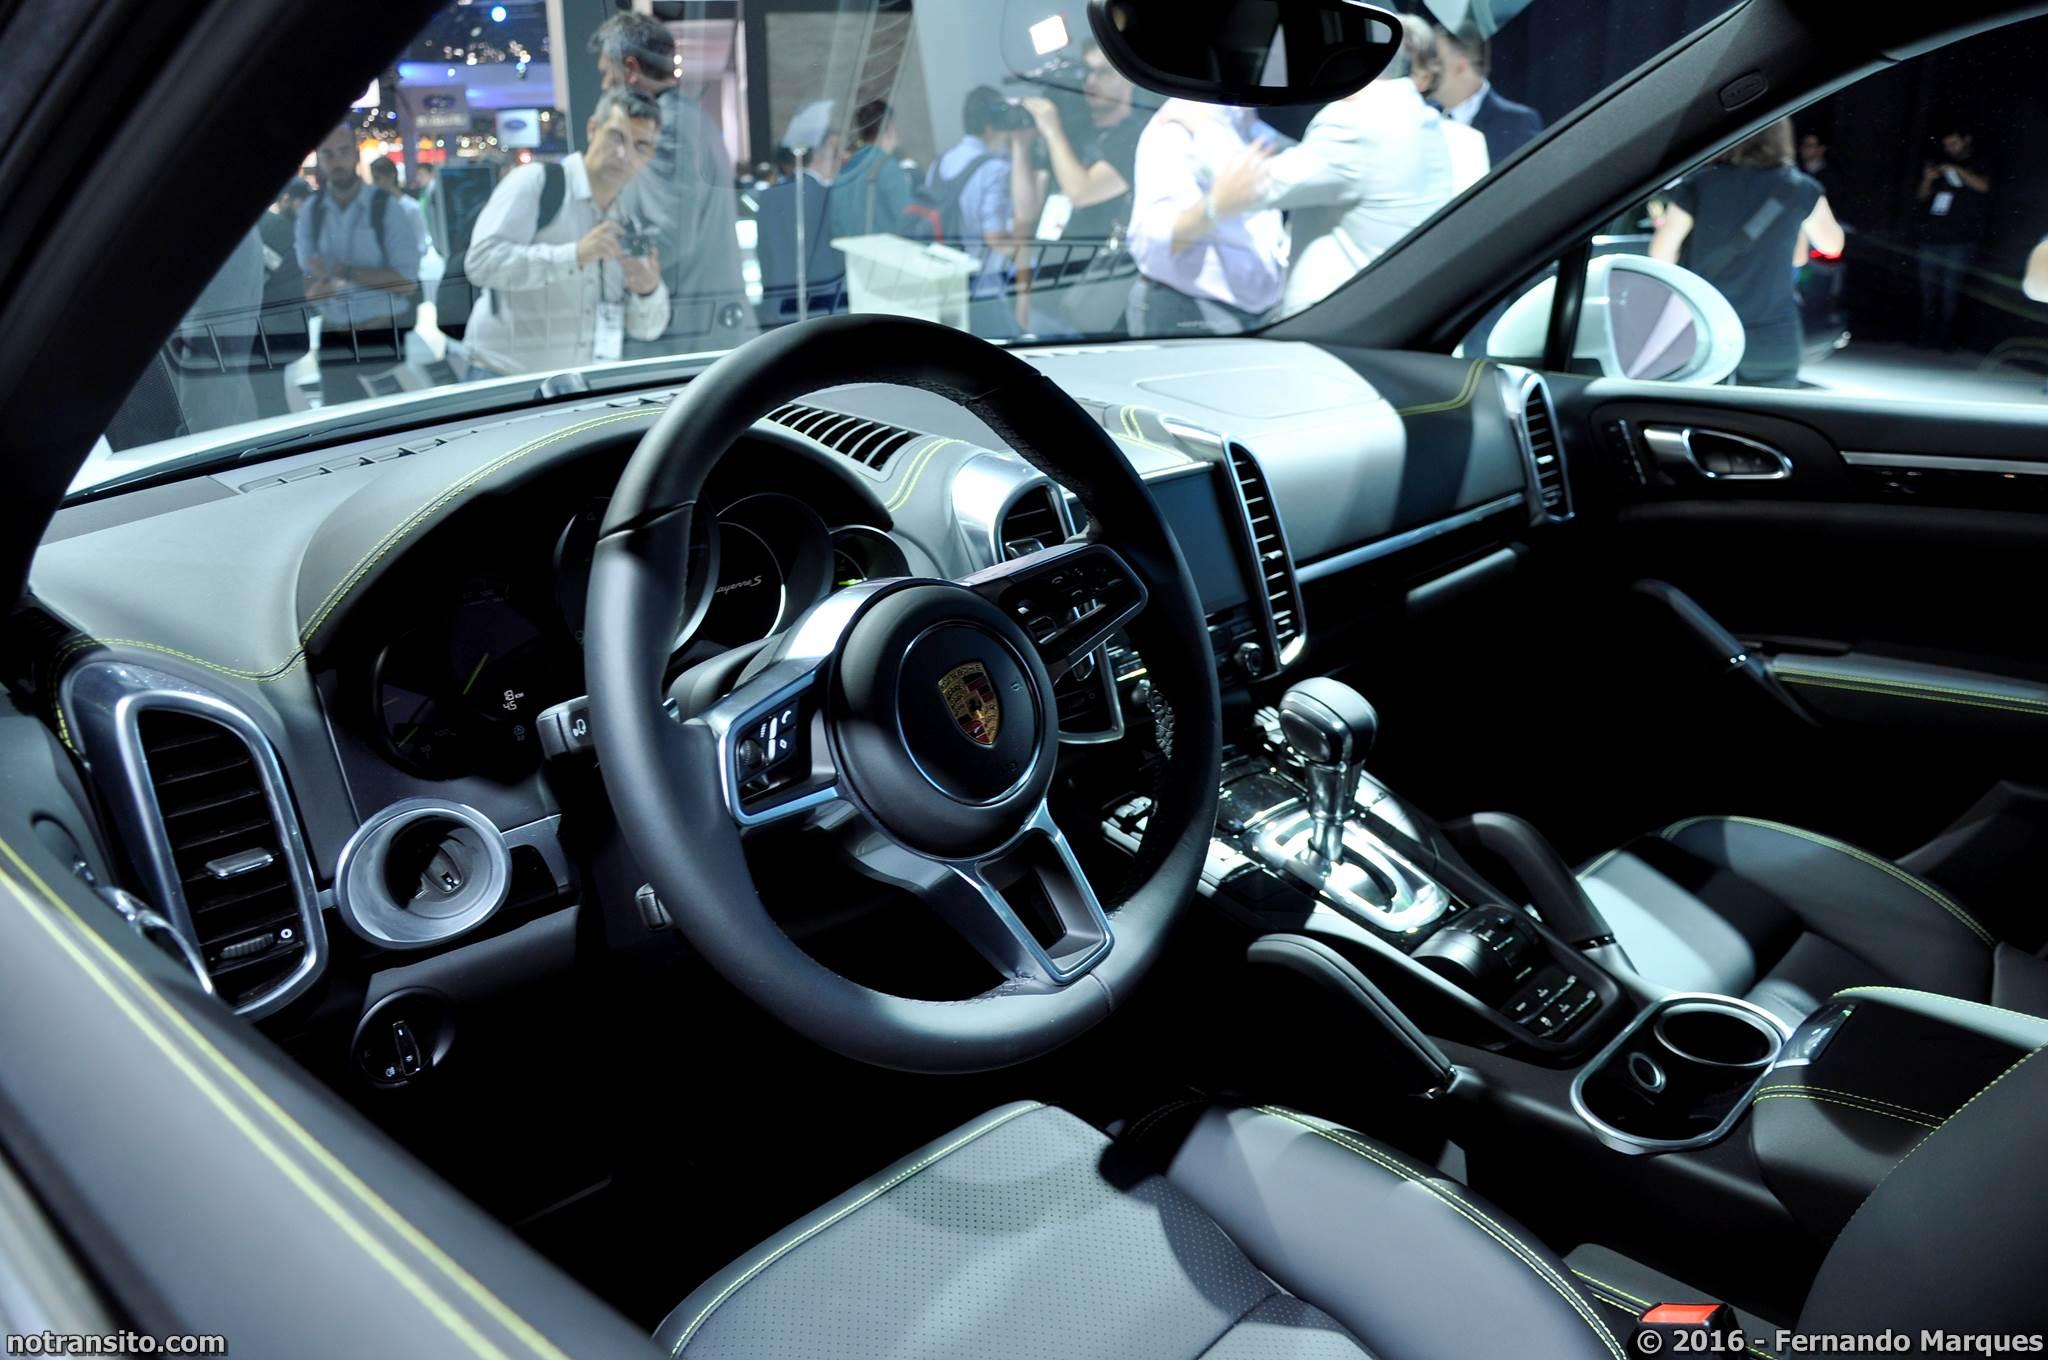 Porsche Cayenne S E-Hybrid Salão do Automóvel 2016